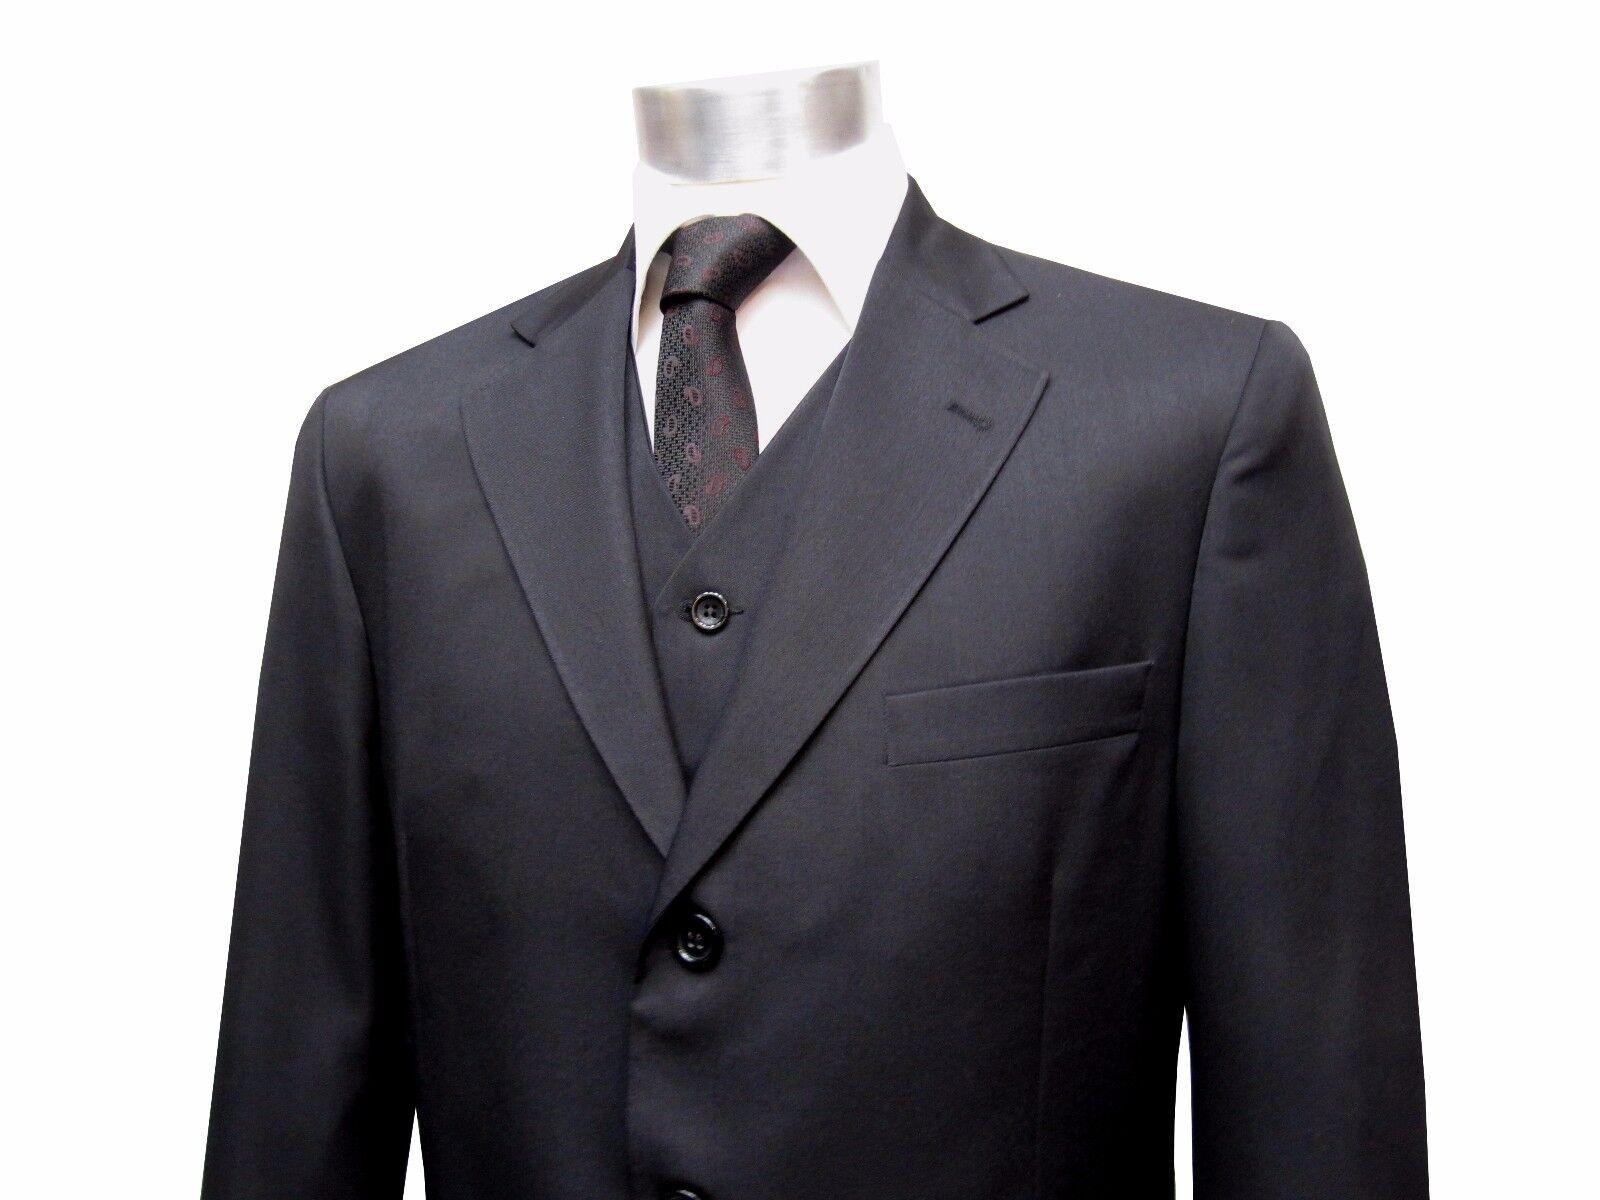 herren sakko jacke blazer schwarz eur 49 90 picclick de. Black Bedroom Furniture Sets. Home Design Ideas